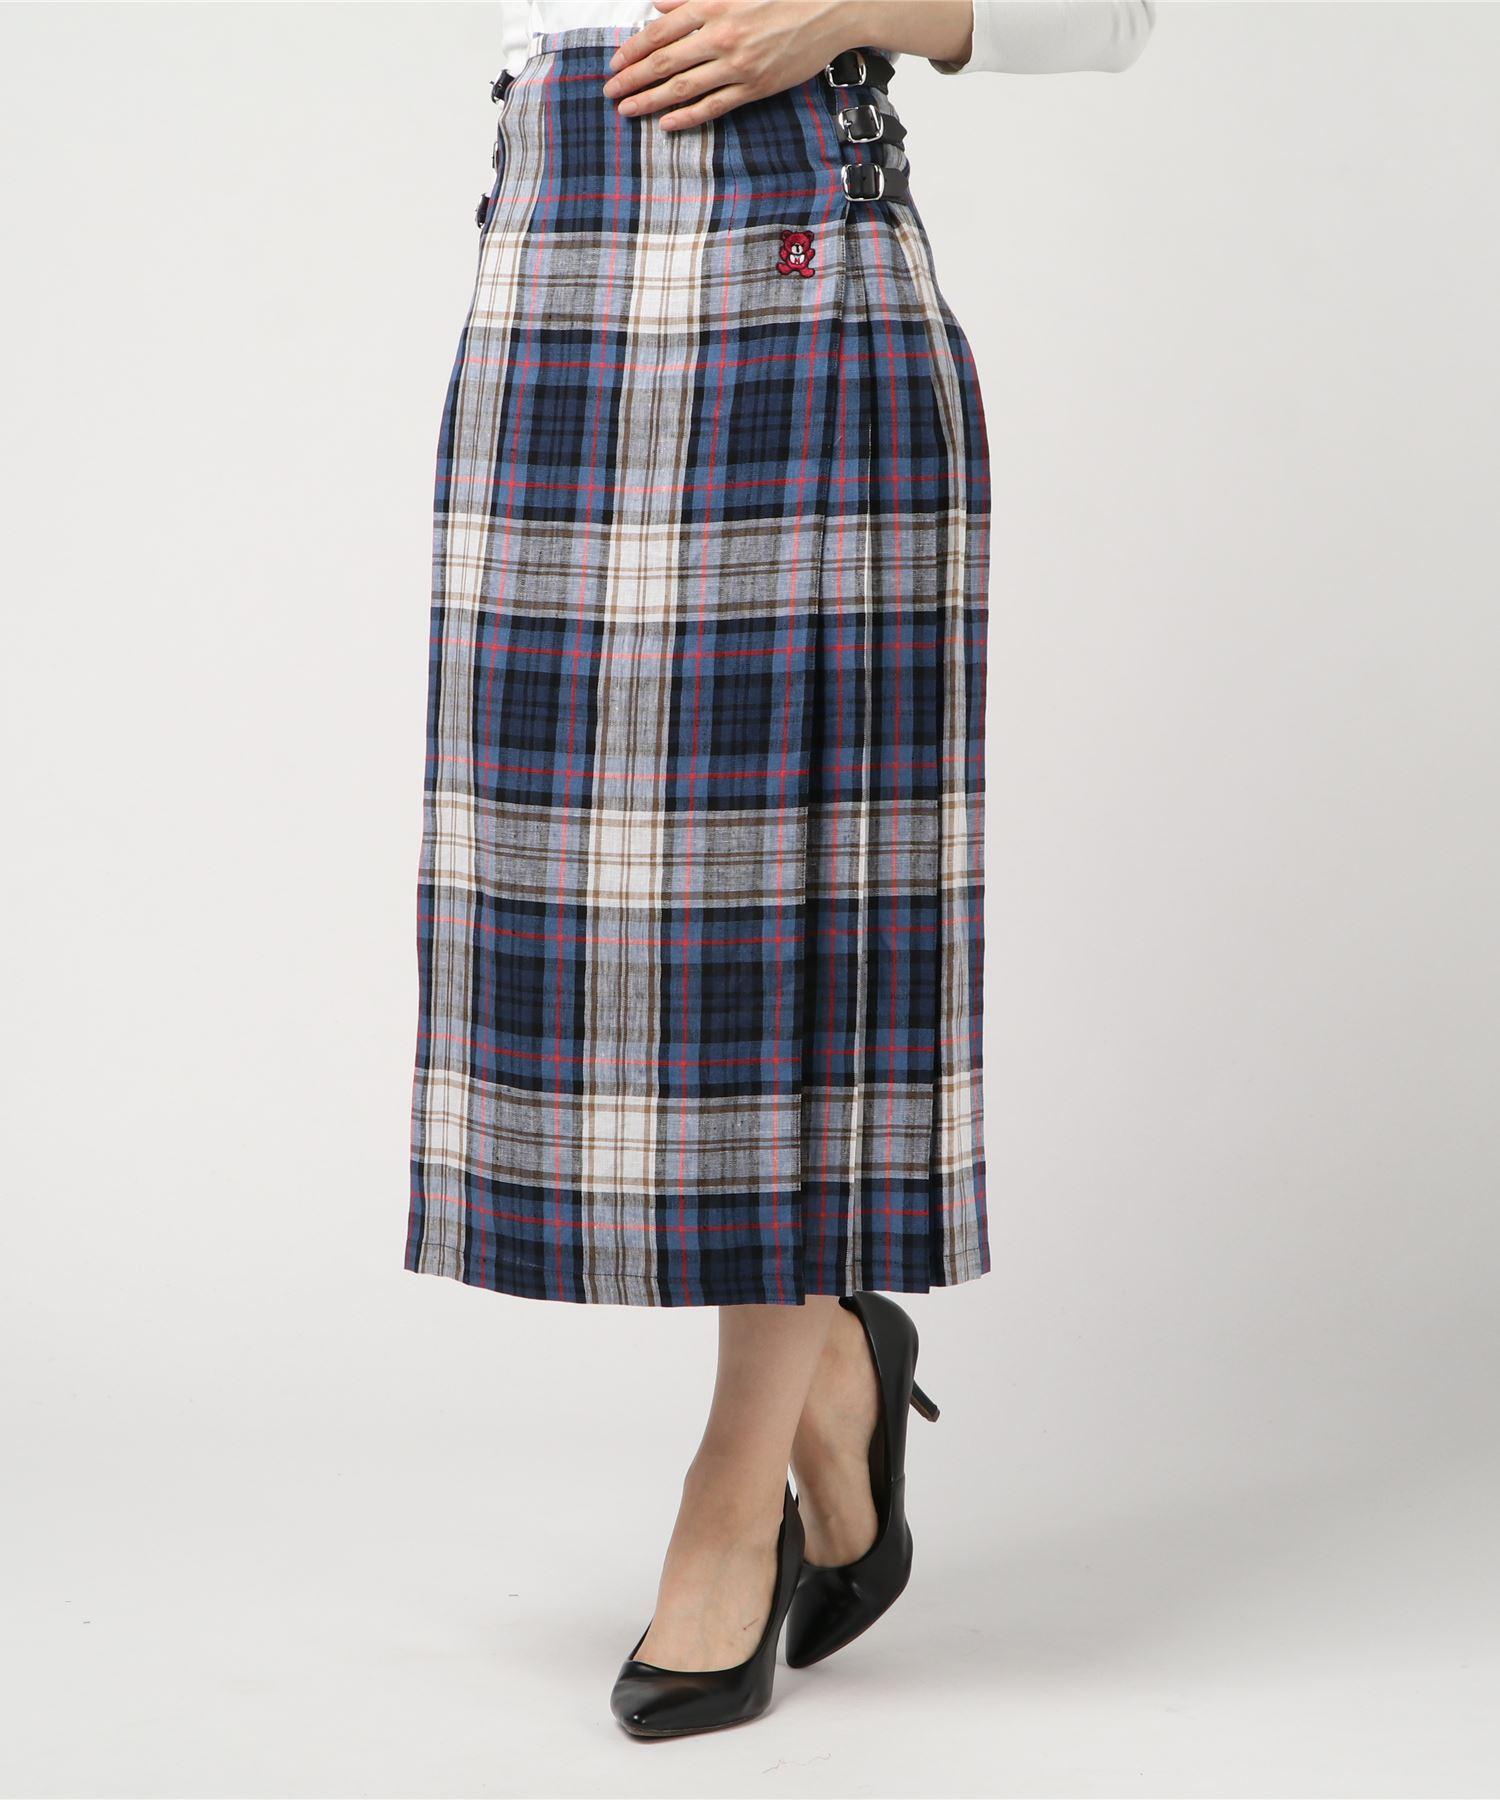 O'NEIL of DUBLIN HYS BEAR刺繍ロング巻きスカート